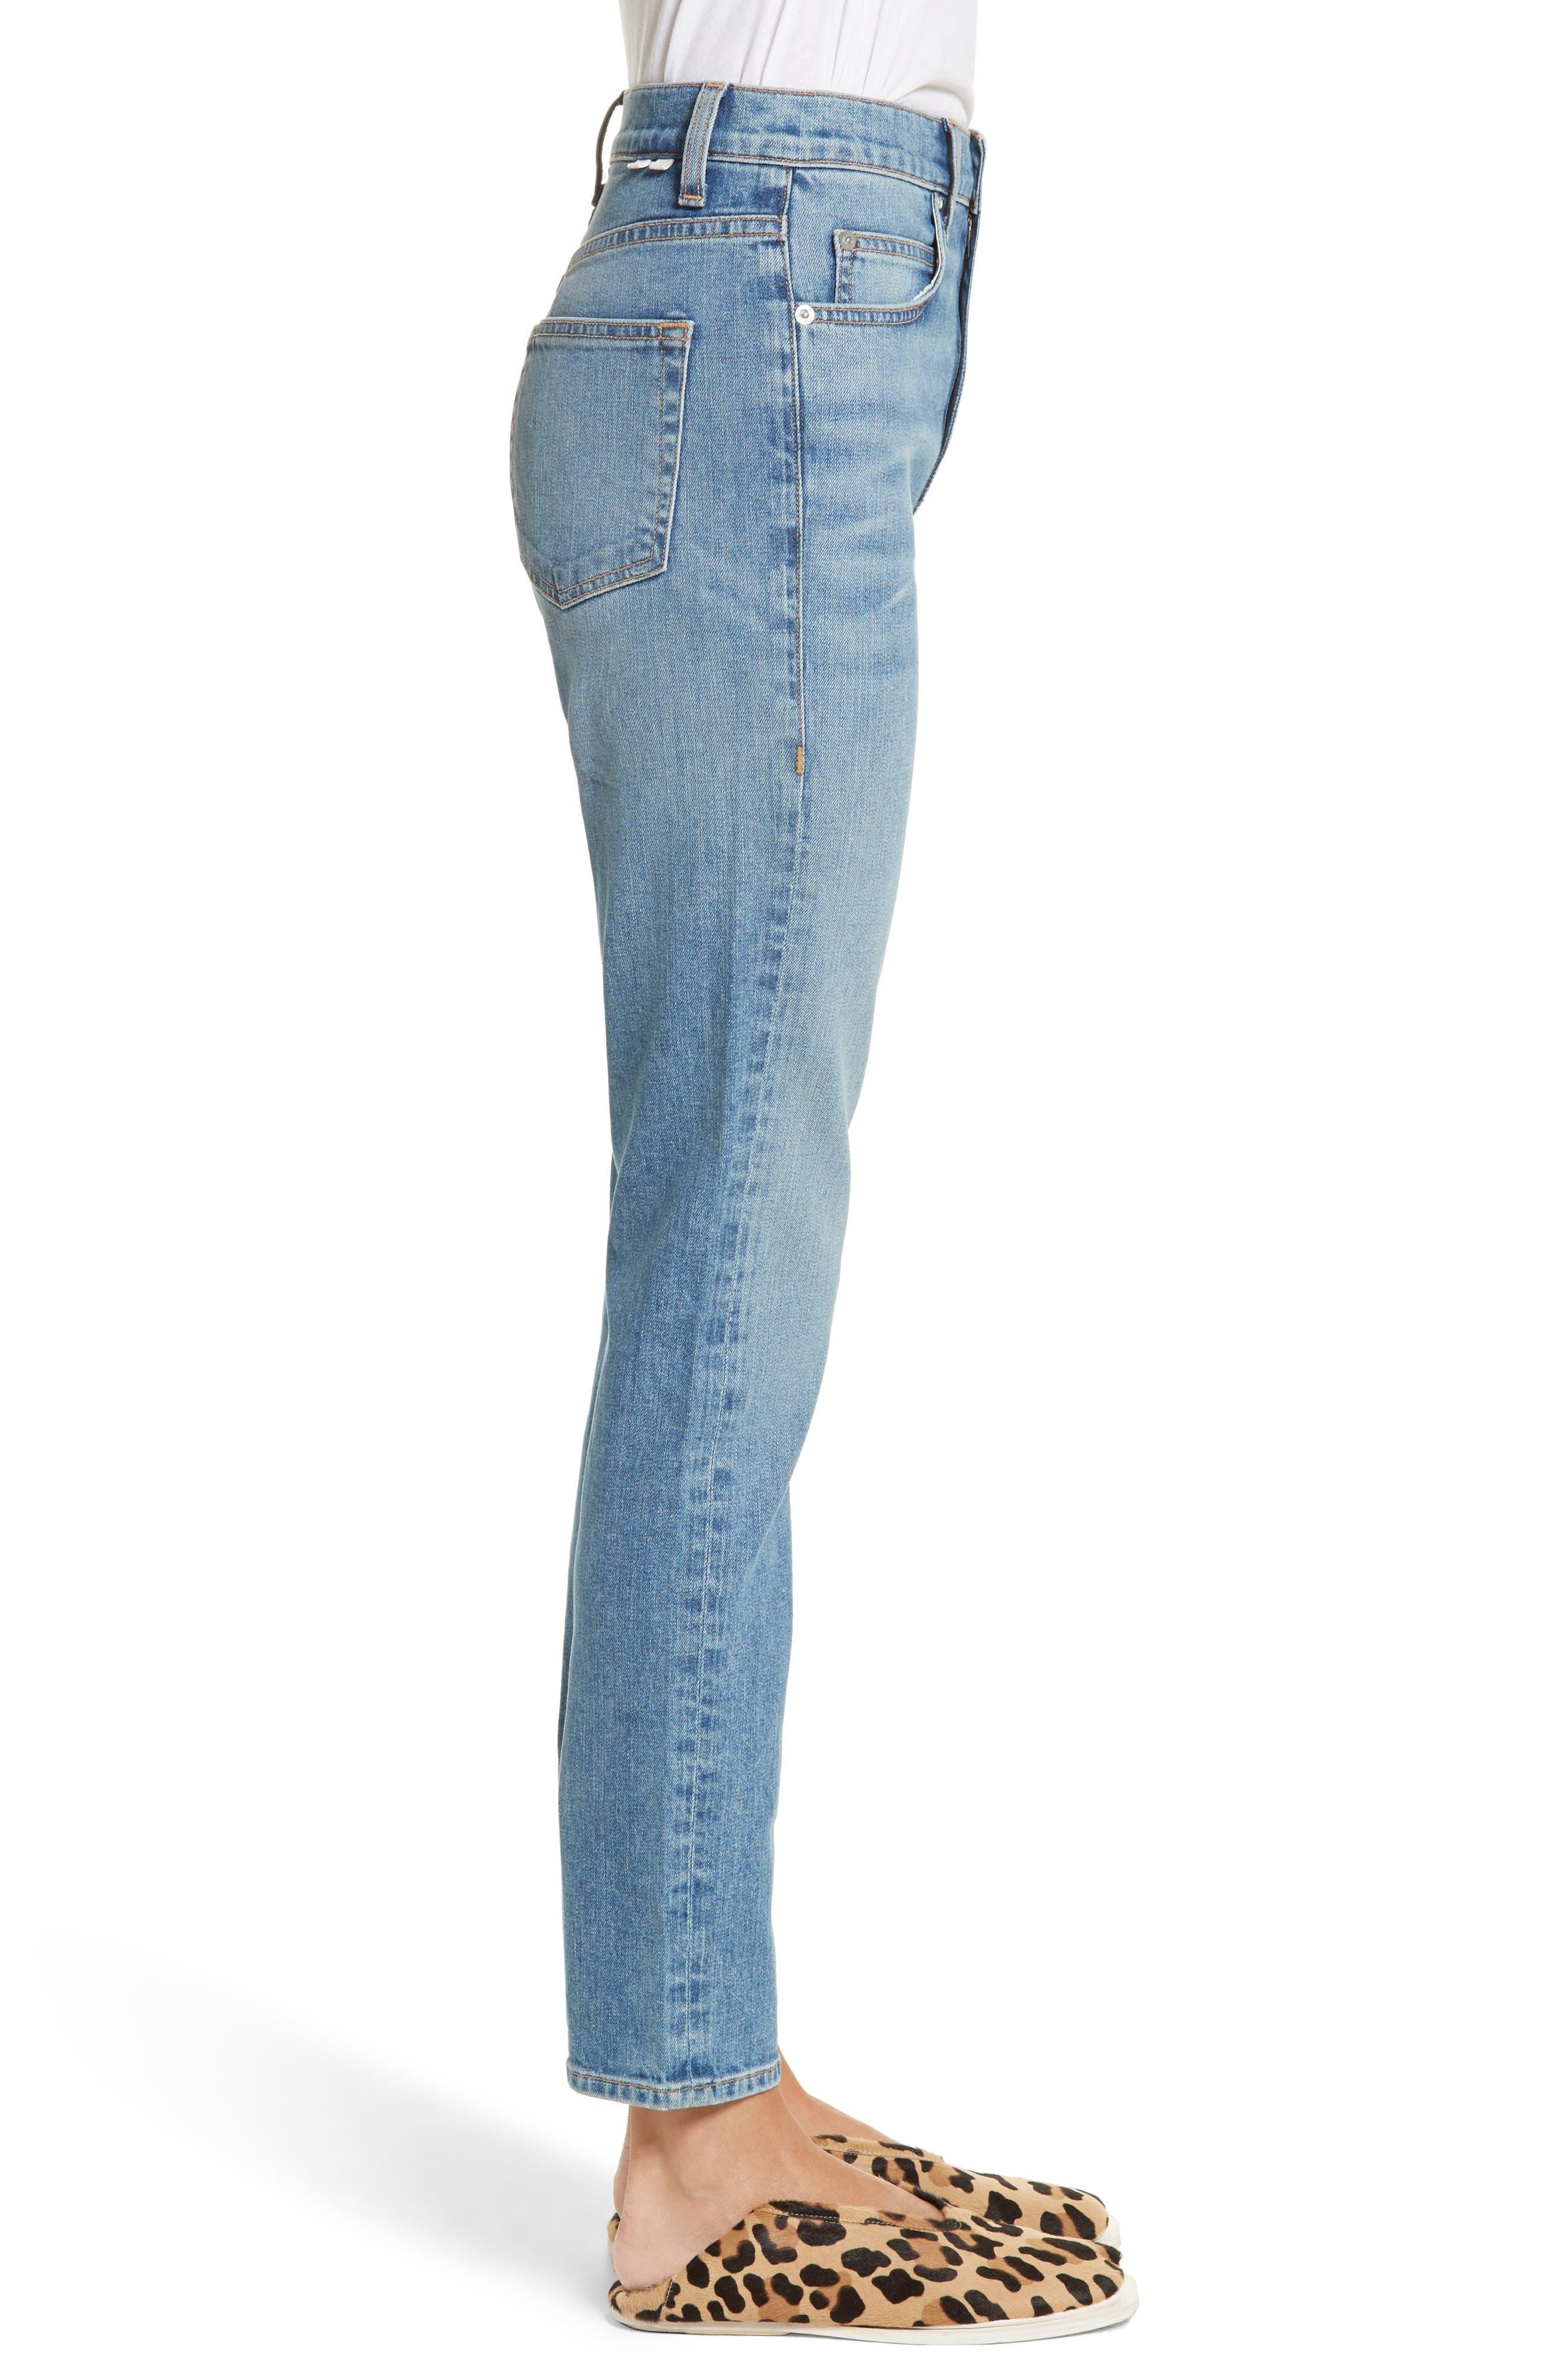 PSWL Straight Leg Jeans,                             Alternate thumbnail 3, color,                             428